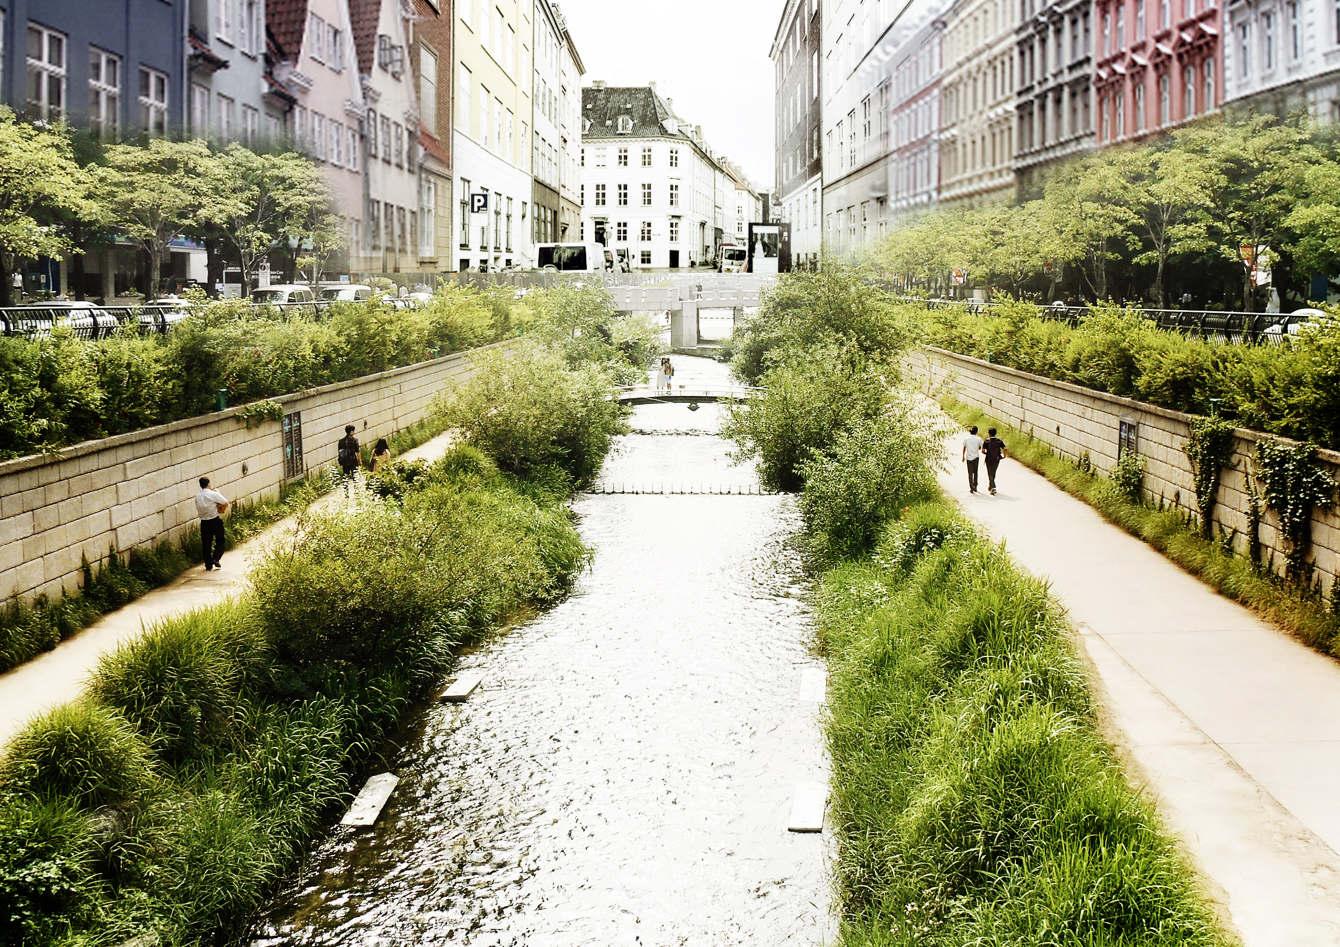 THE CANAL CITY IN COPENHAGEN IN 2050